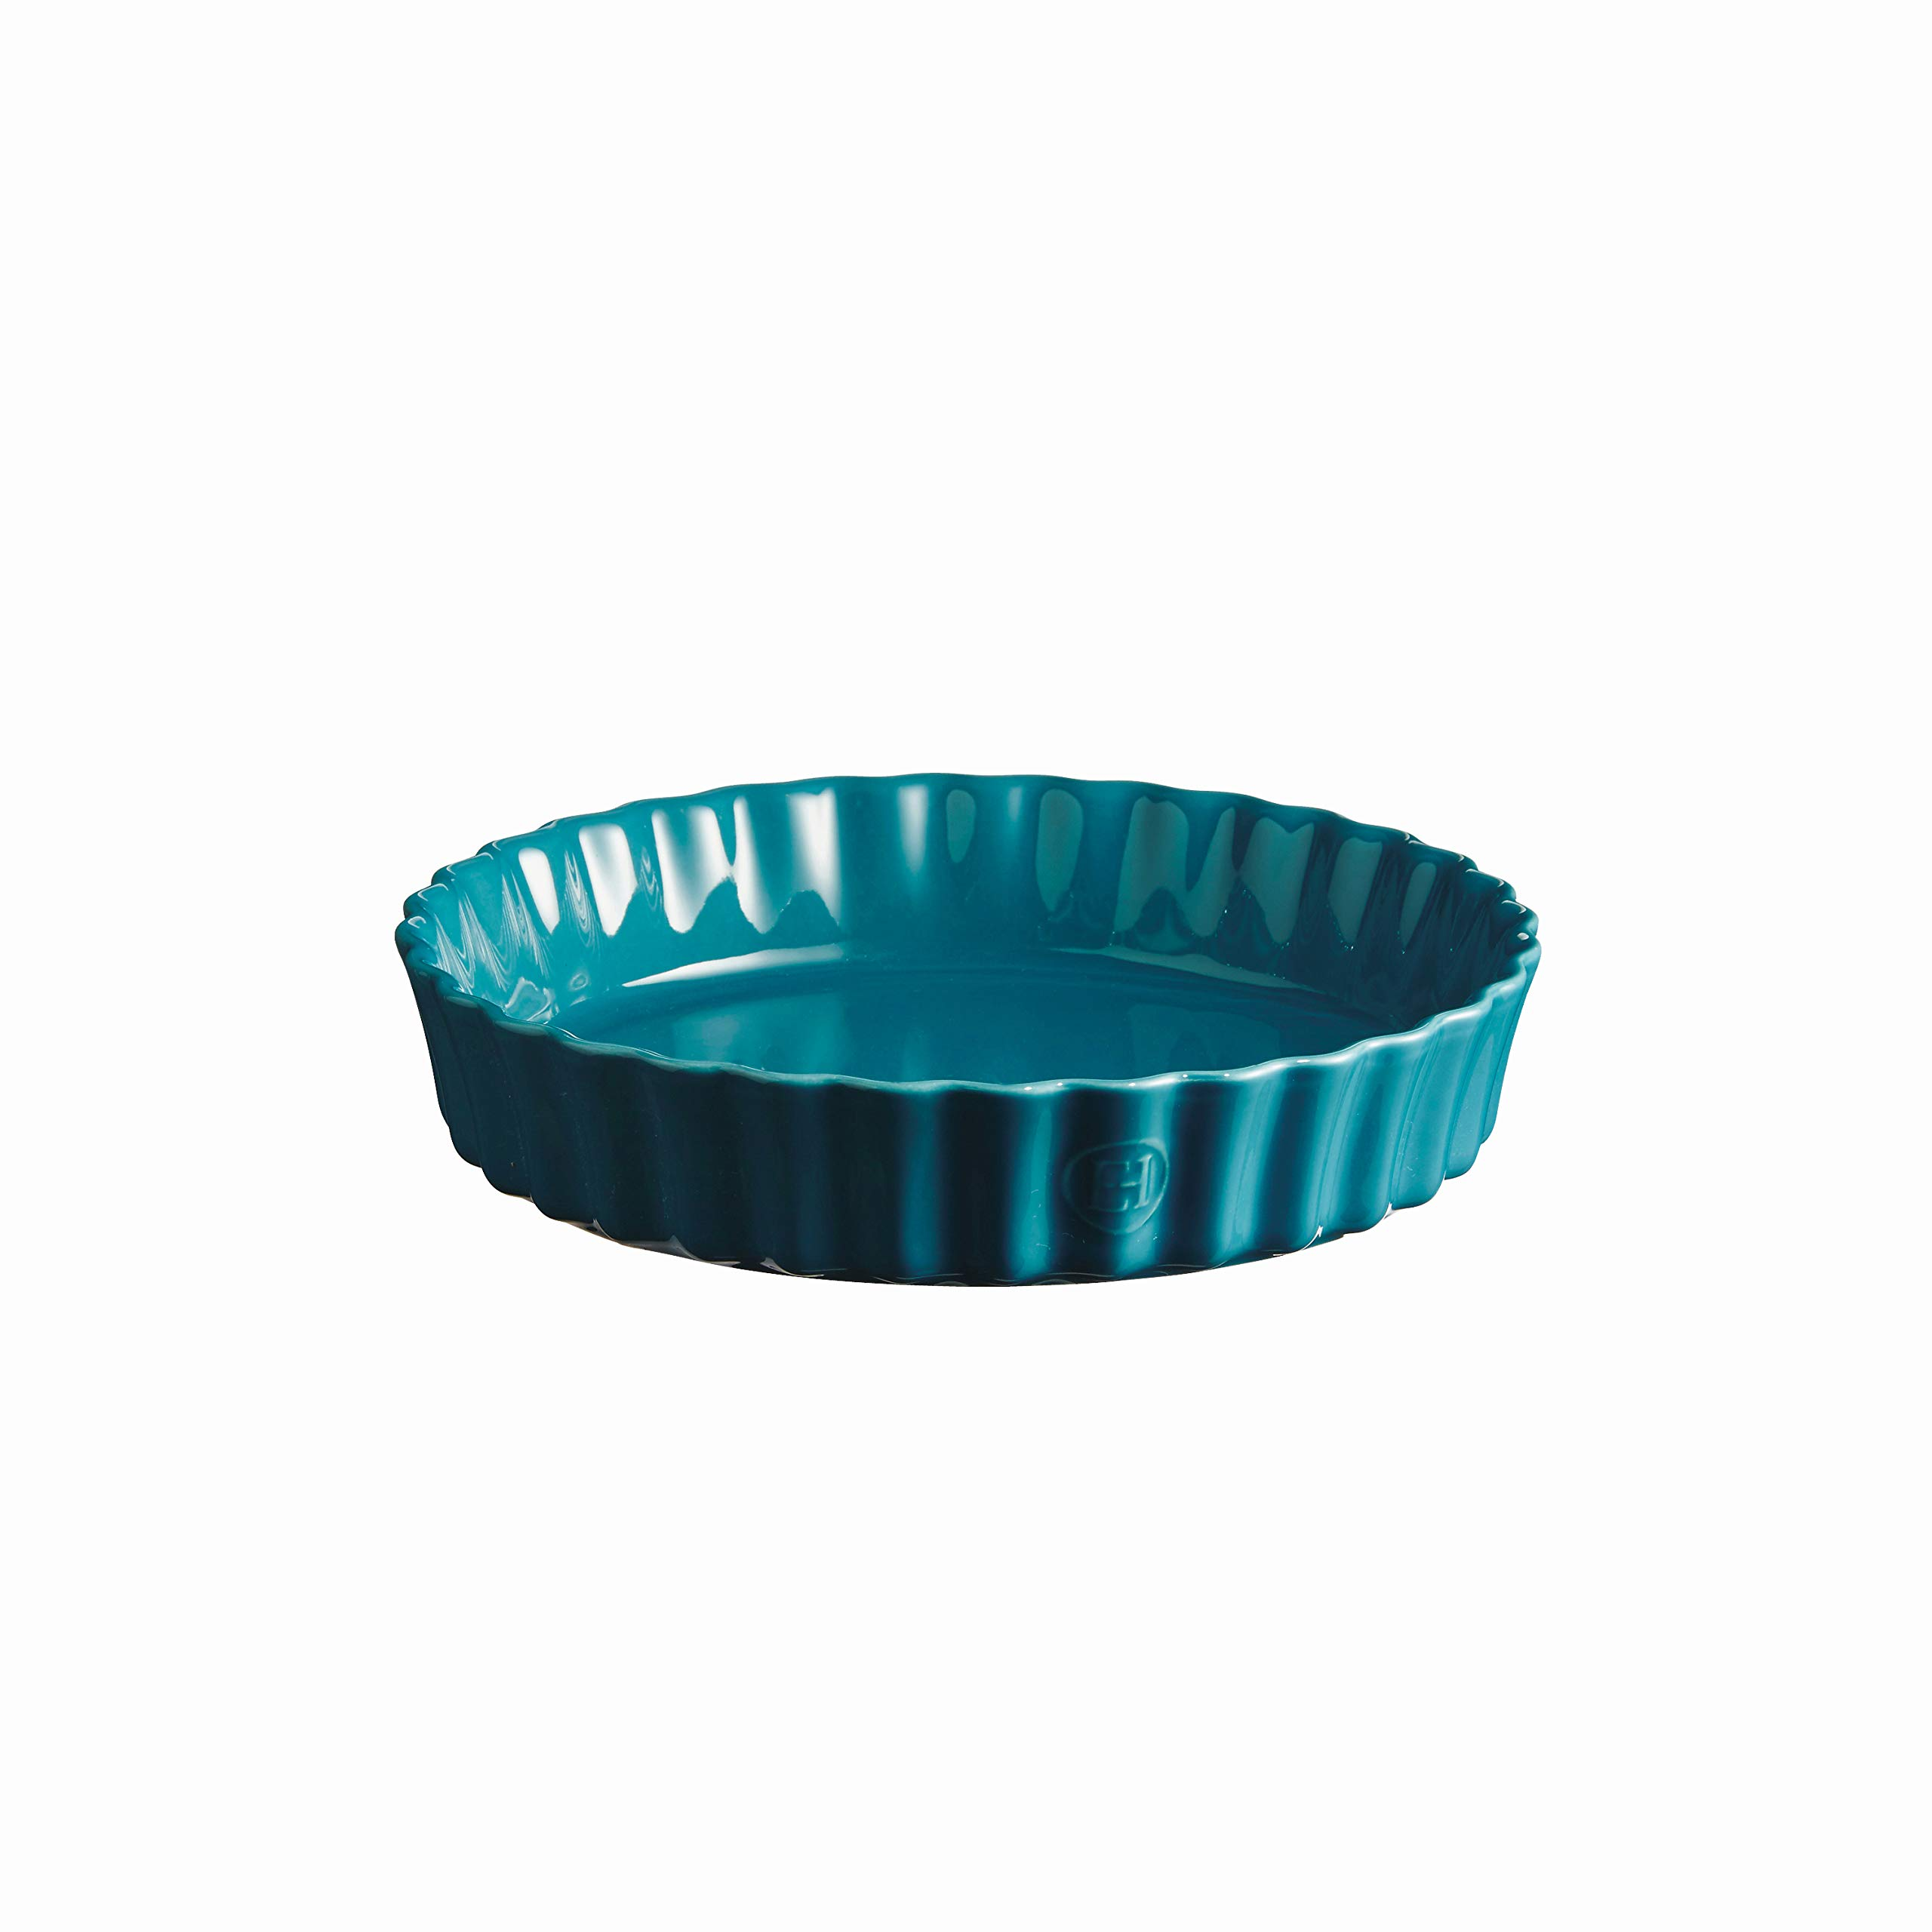 Emile Henry 606024 Deep Flan, Mediterranean Blue Quiche Dish, 1.2 qt, by Emile Henry (Image #1)